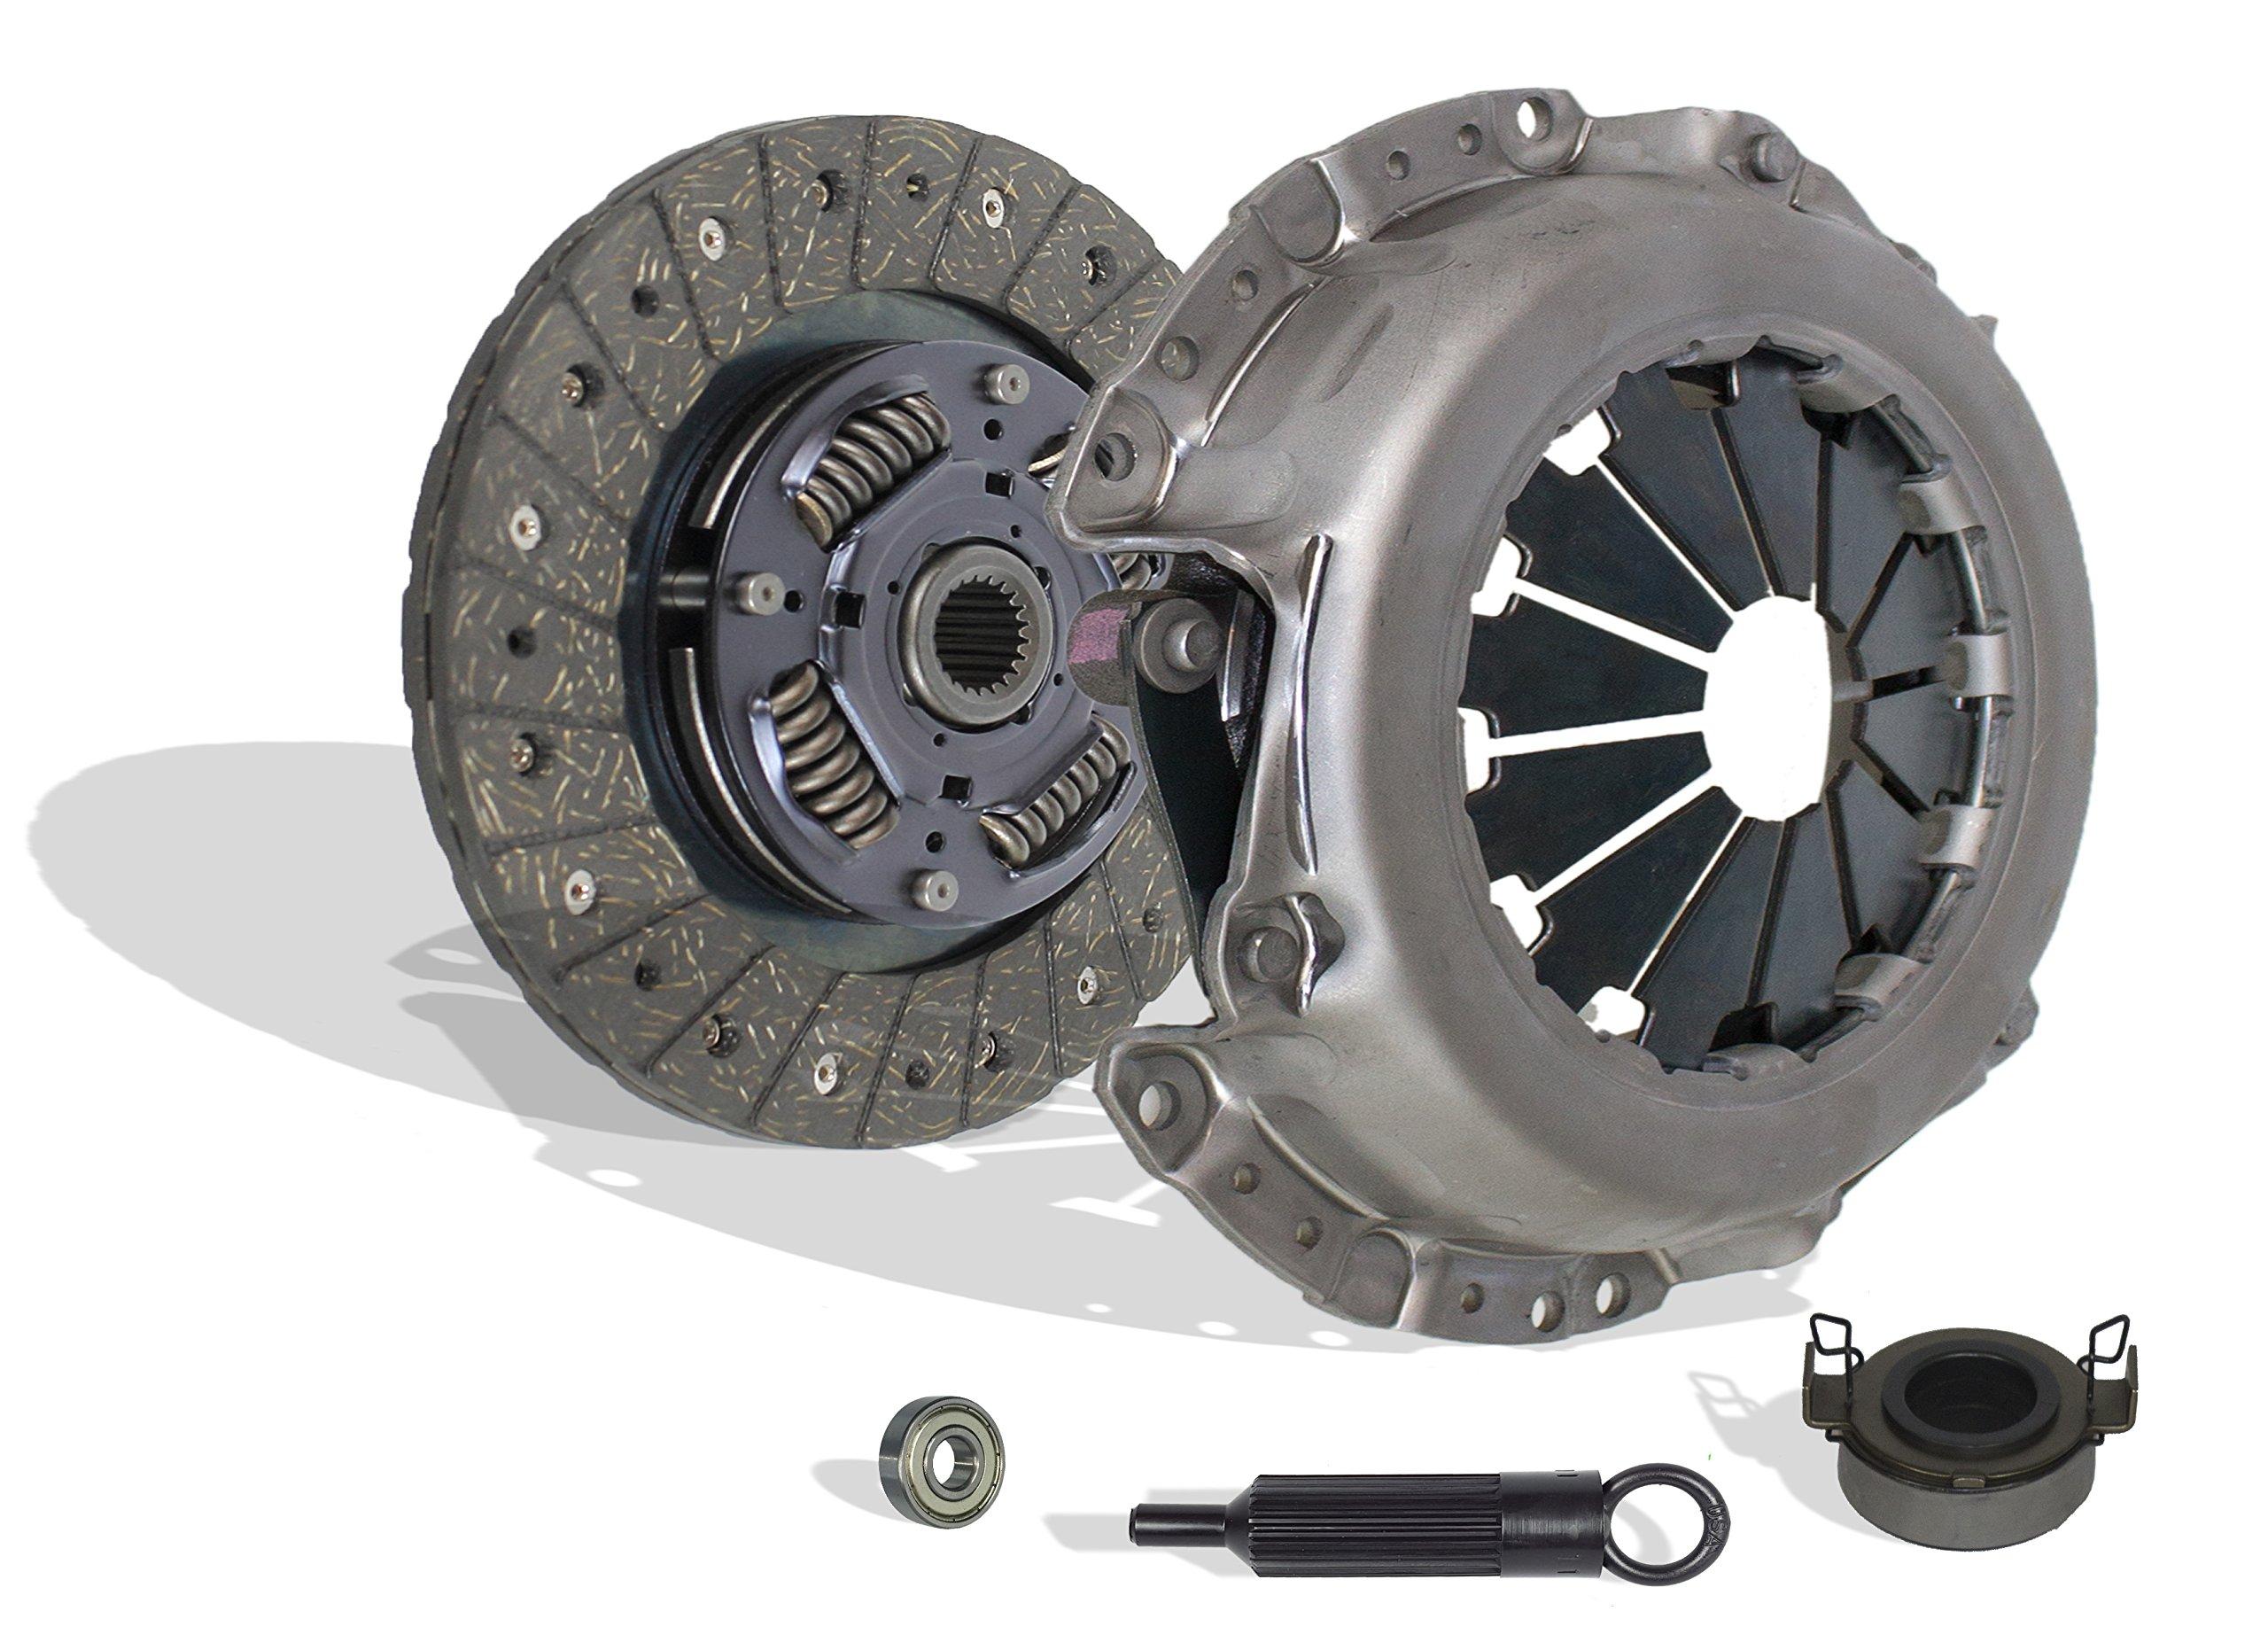 Clutch Kit Works With Toyota Corolla Matrix MR2 Spyder Celica Pontiac Vibe Geo Prizm Base Gsi Lsi S Ce Le St Xr 1.6L L4 1.8L L4 GAS DOHC Naturally Aspirated (1ZZ-FE; 2ZZ-GE)